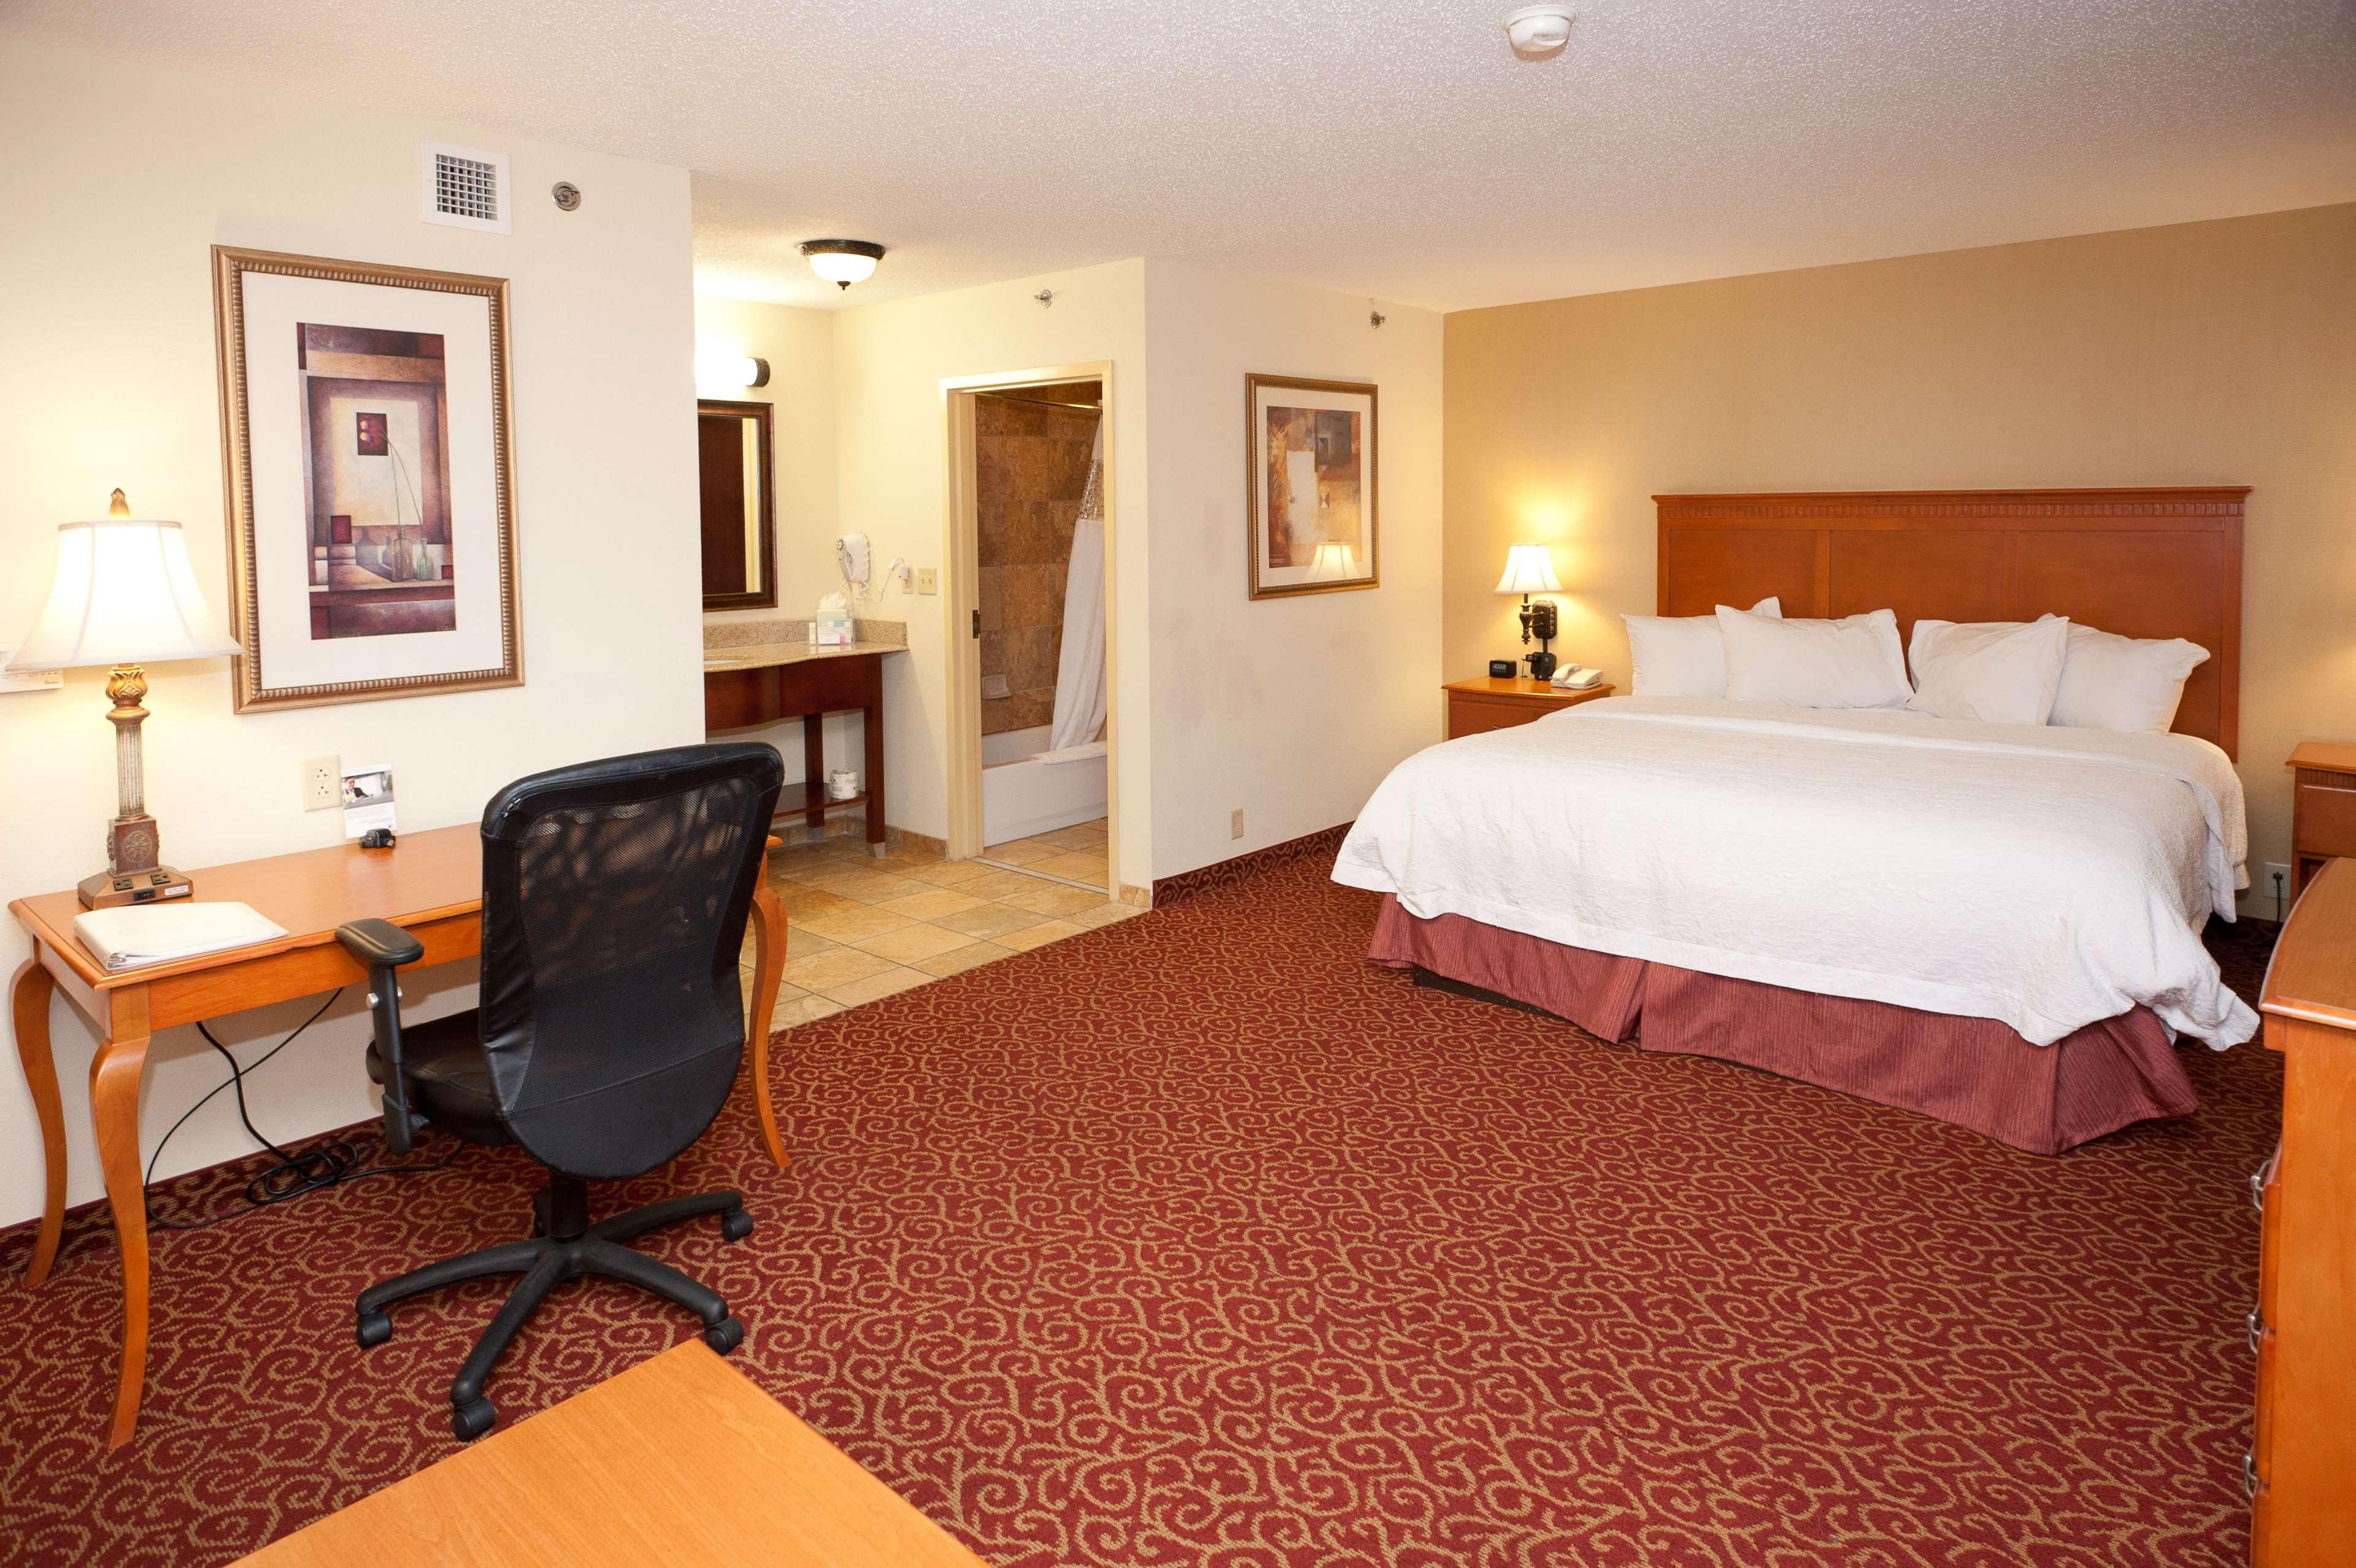 Hampton Inn & Suites Thibodaux image 15